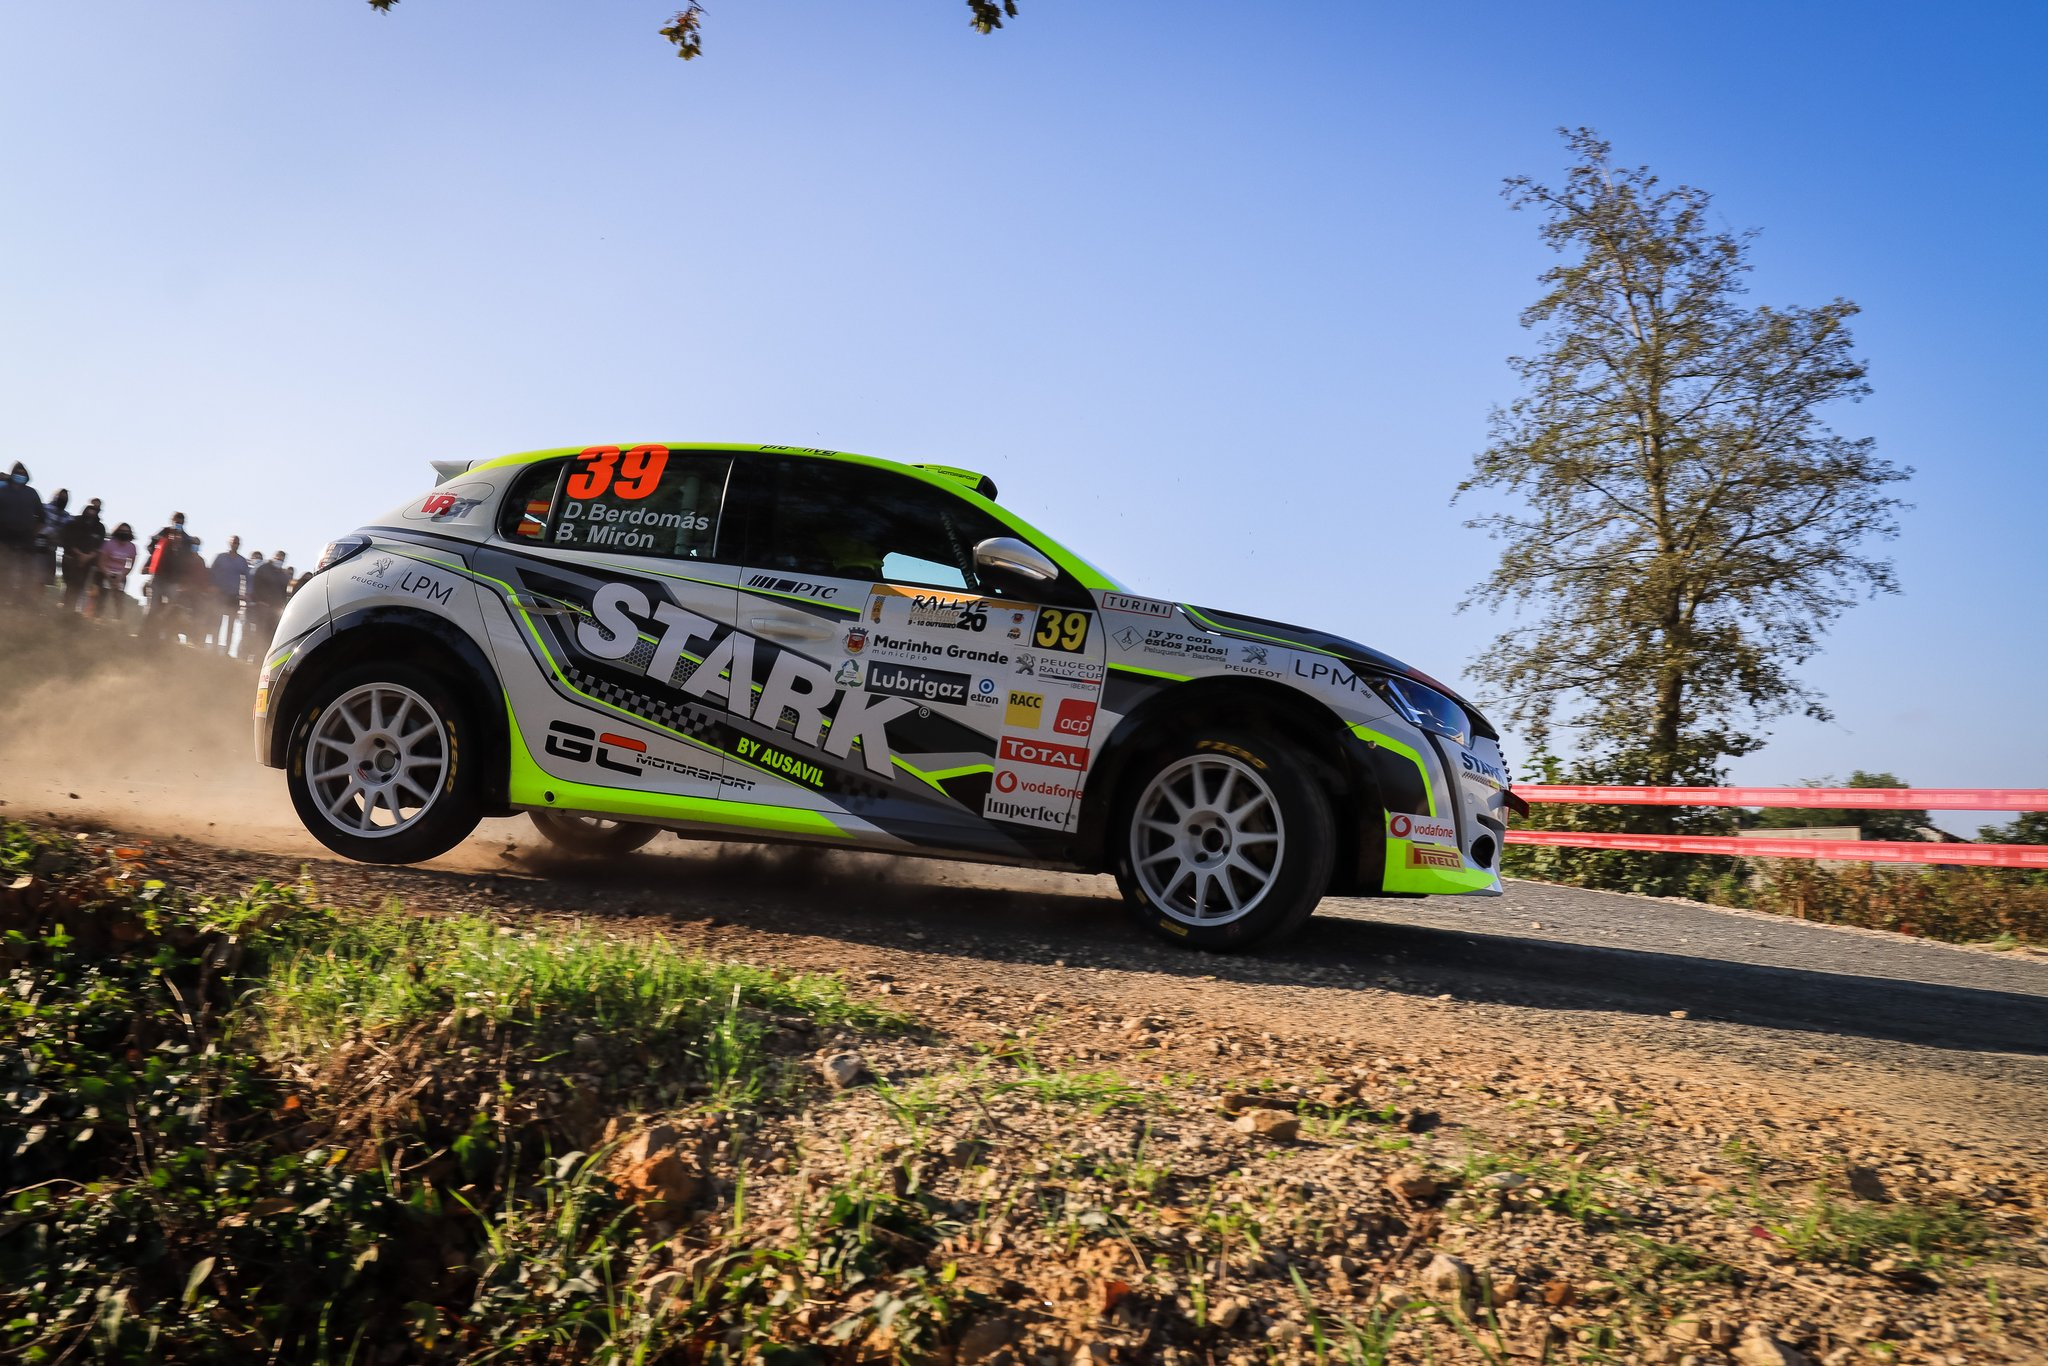 CERA + ERT: 57º Rallye Princesa de Asturias - Ciudad de Oviedo [23-24 Octubre] Ekx2uXHWMAES_6W?format=jpg&name=large